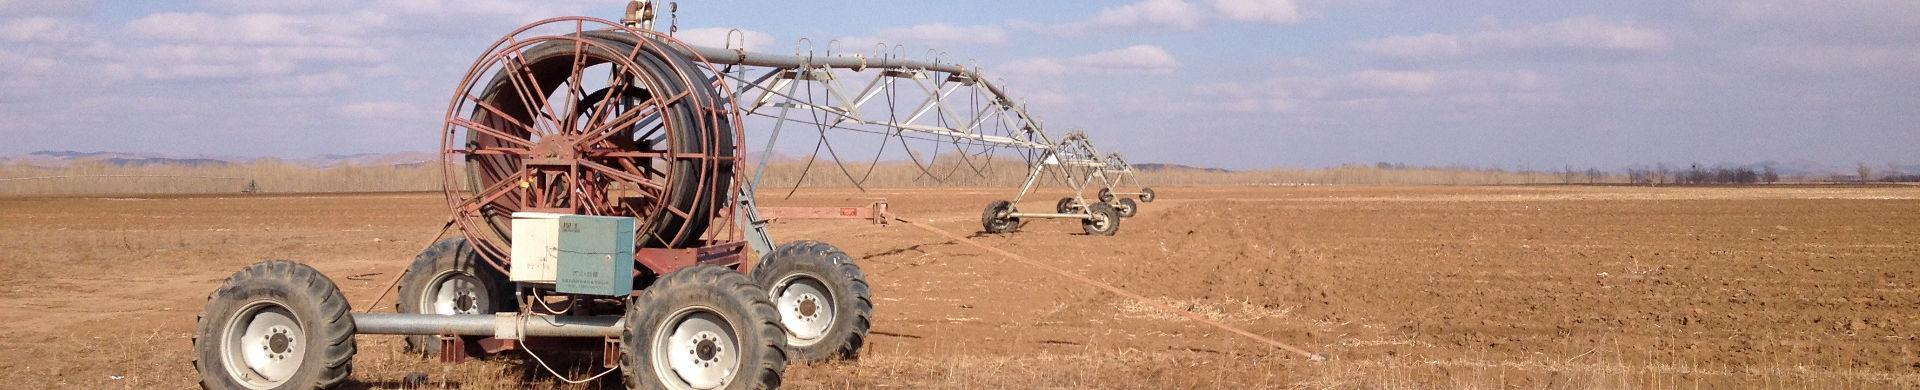 header-irrigatie-cc0-king-h-via-pixabay